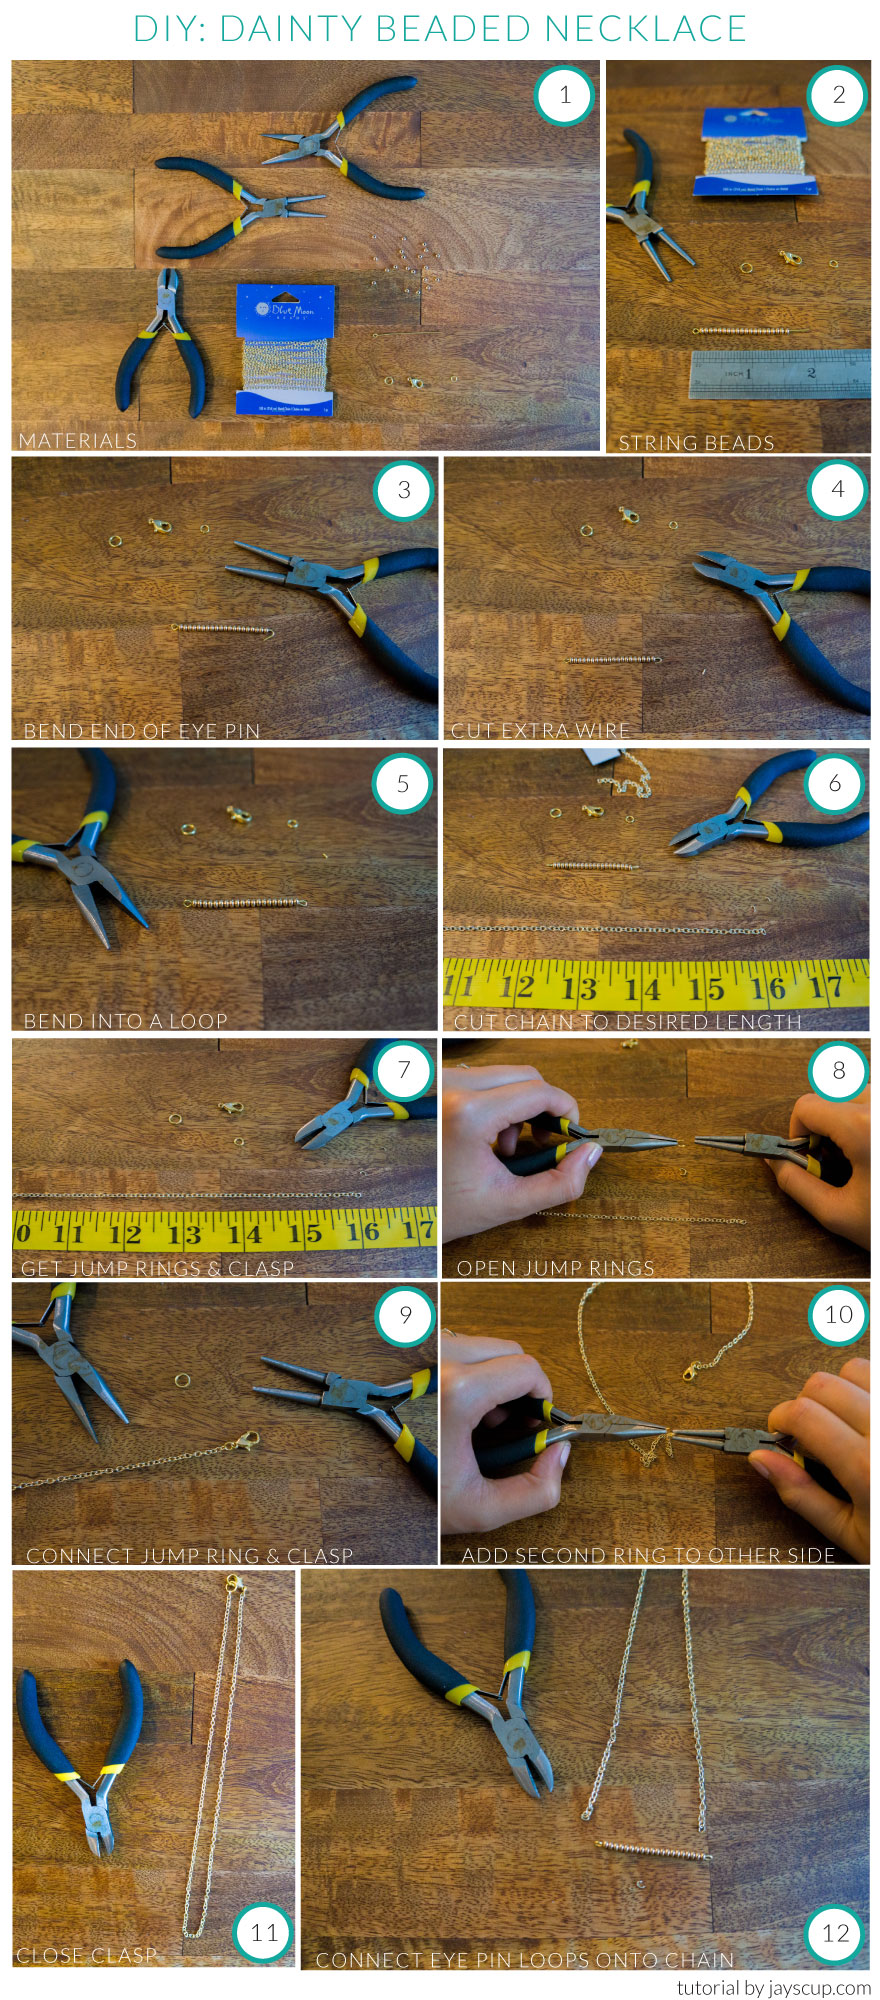 DIY Dainty Beaded Necklace